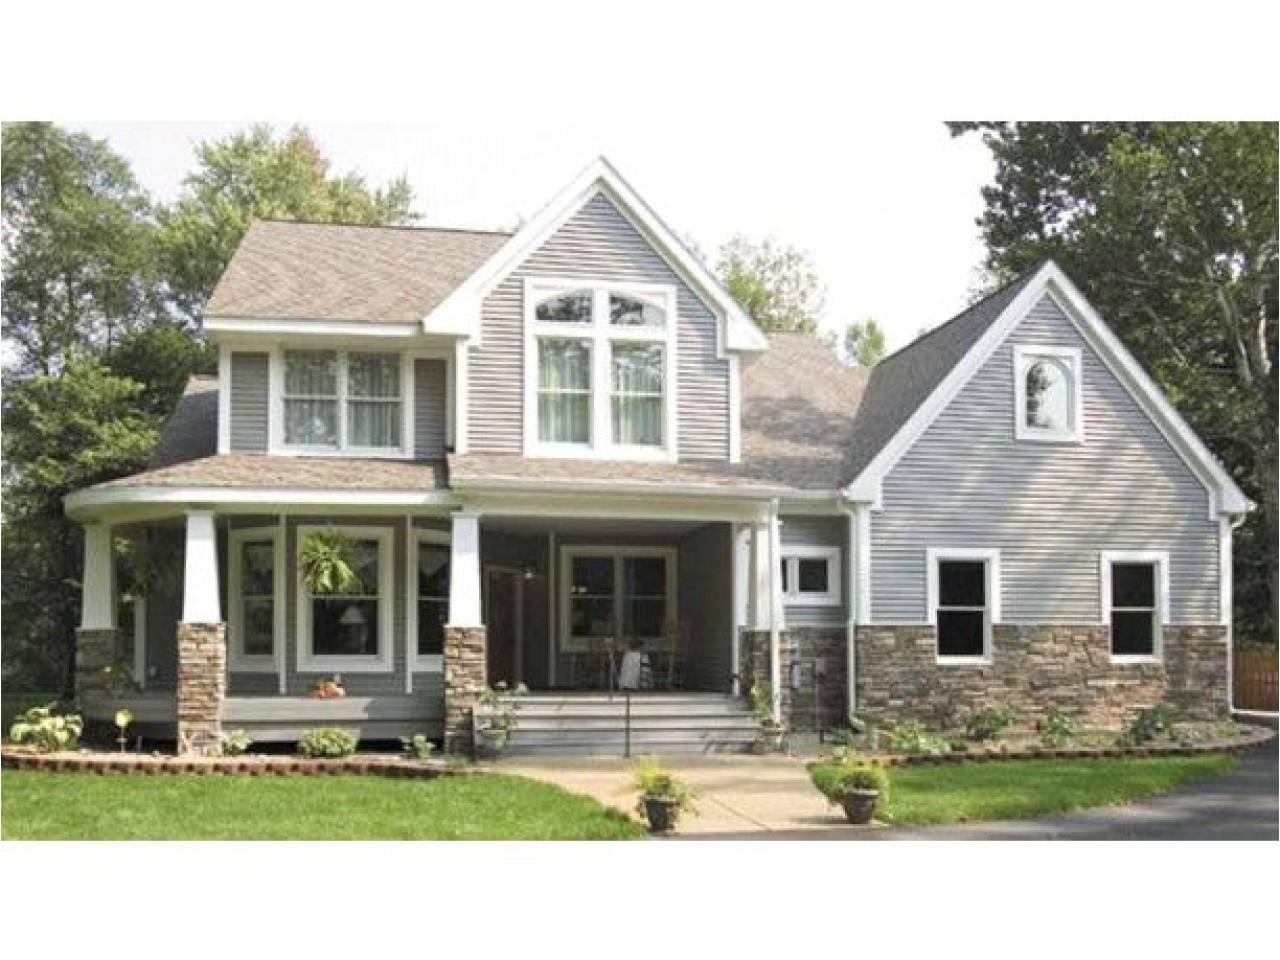 b9b4bc253bf99b42 2 story craftsman farmhouse house plan 2 story traditional homes